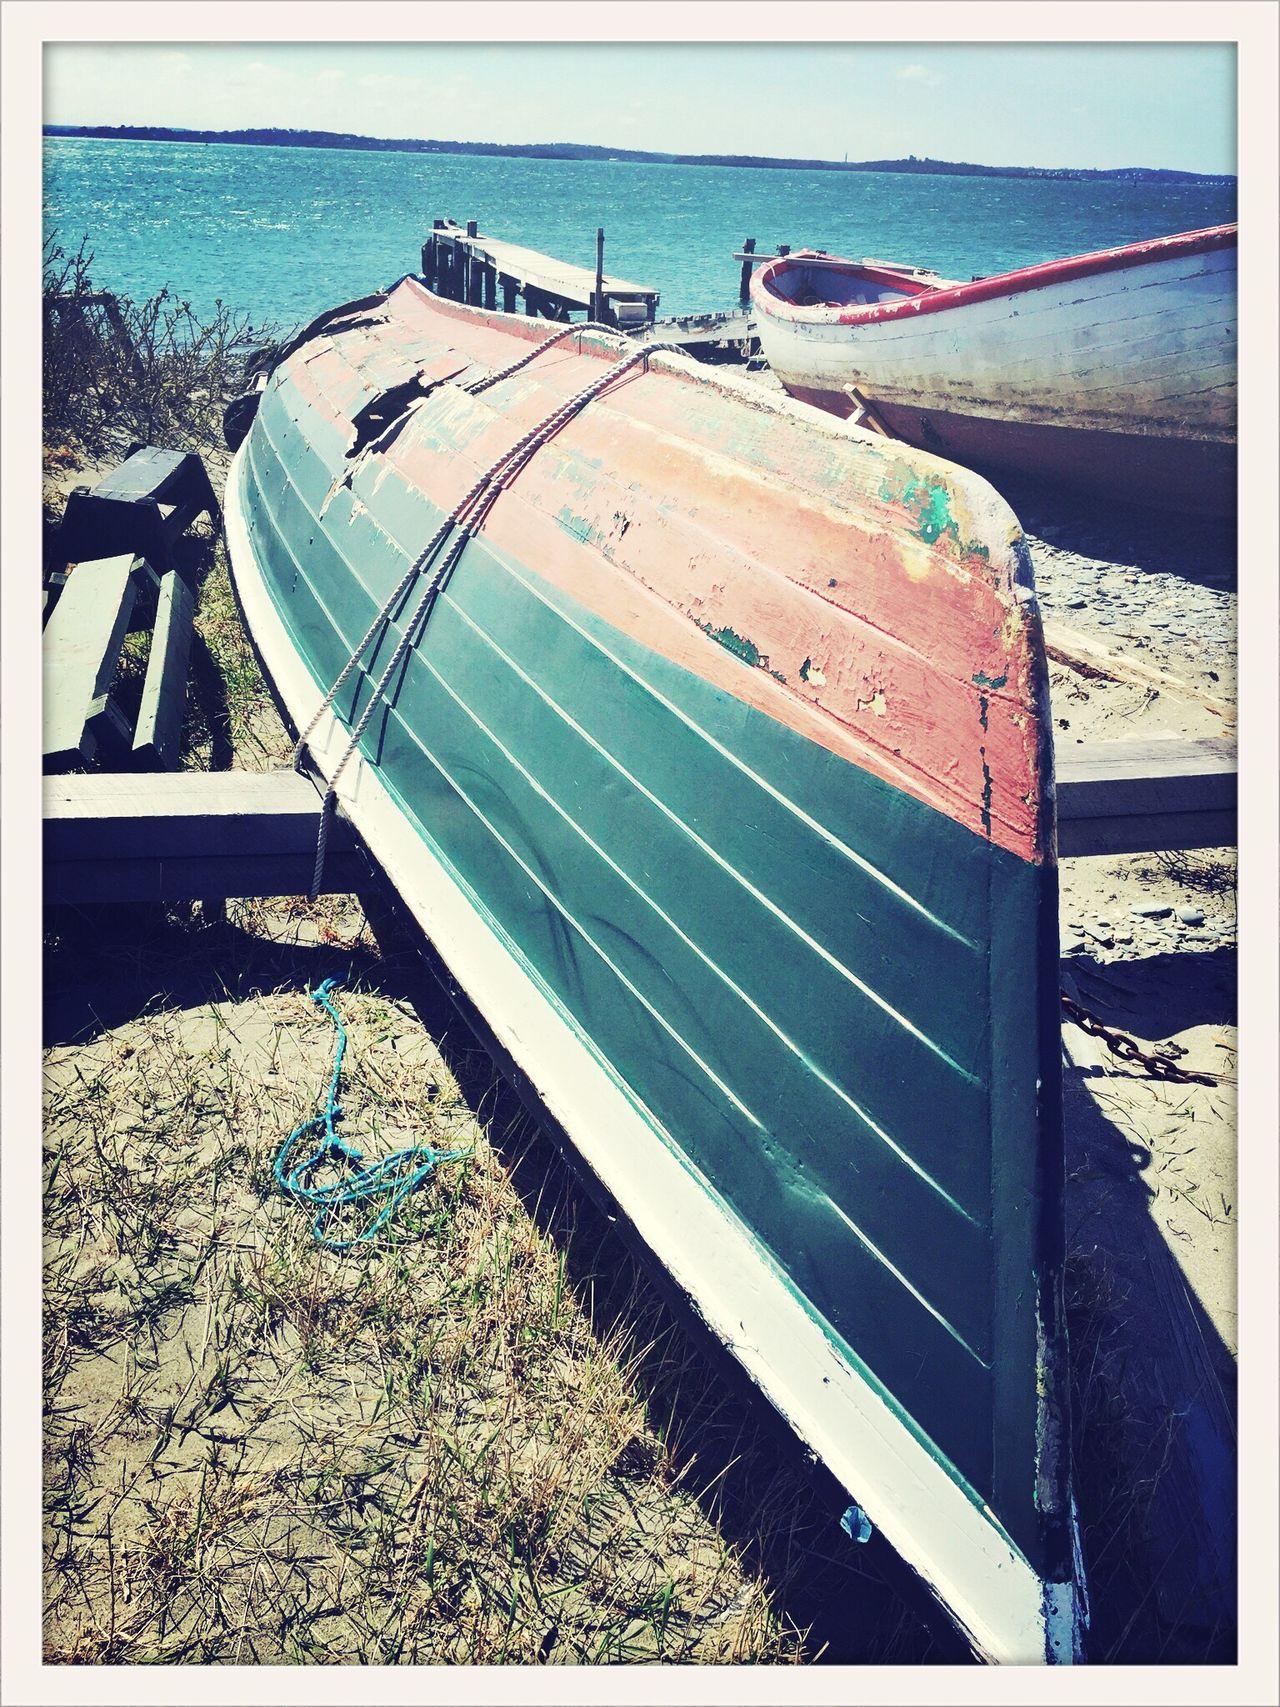 A yesteryear race Nautical Vessel Sea Mode Of Transport NEM Mood AMPt_community Best EyeEm Shot Best Of EyeEm Boating